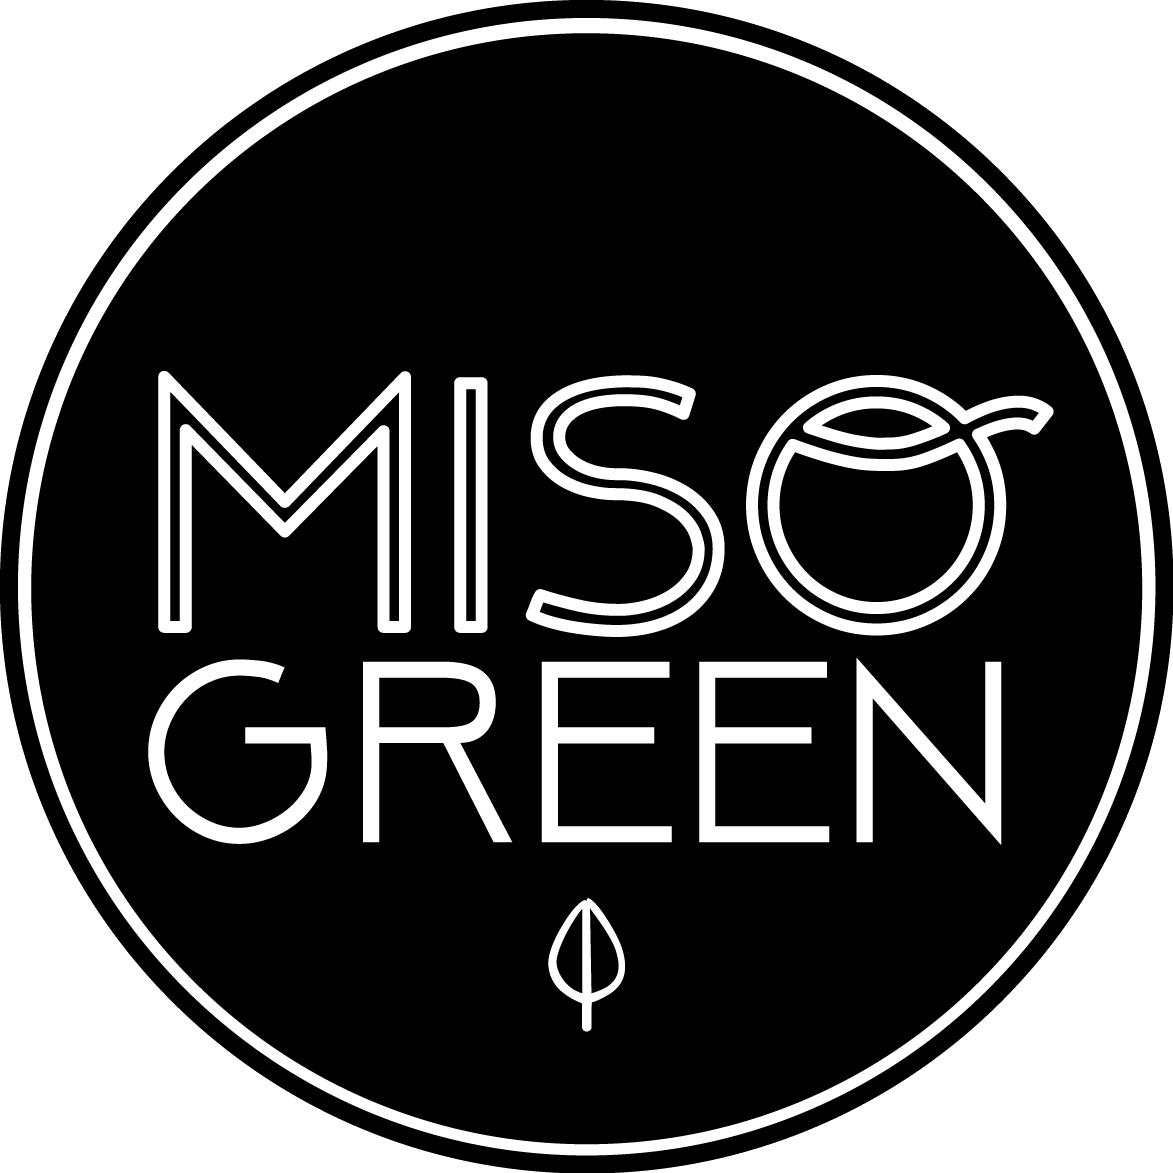 MisoGreenLogo.png